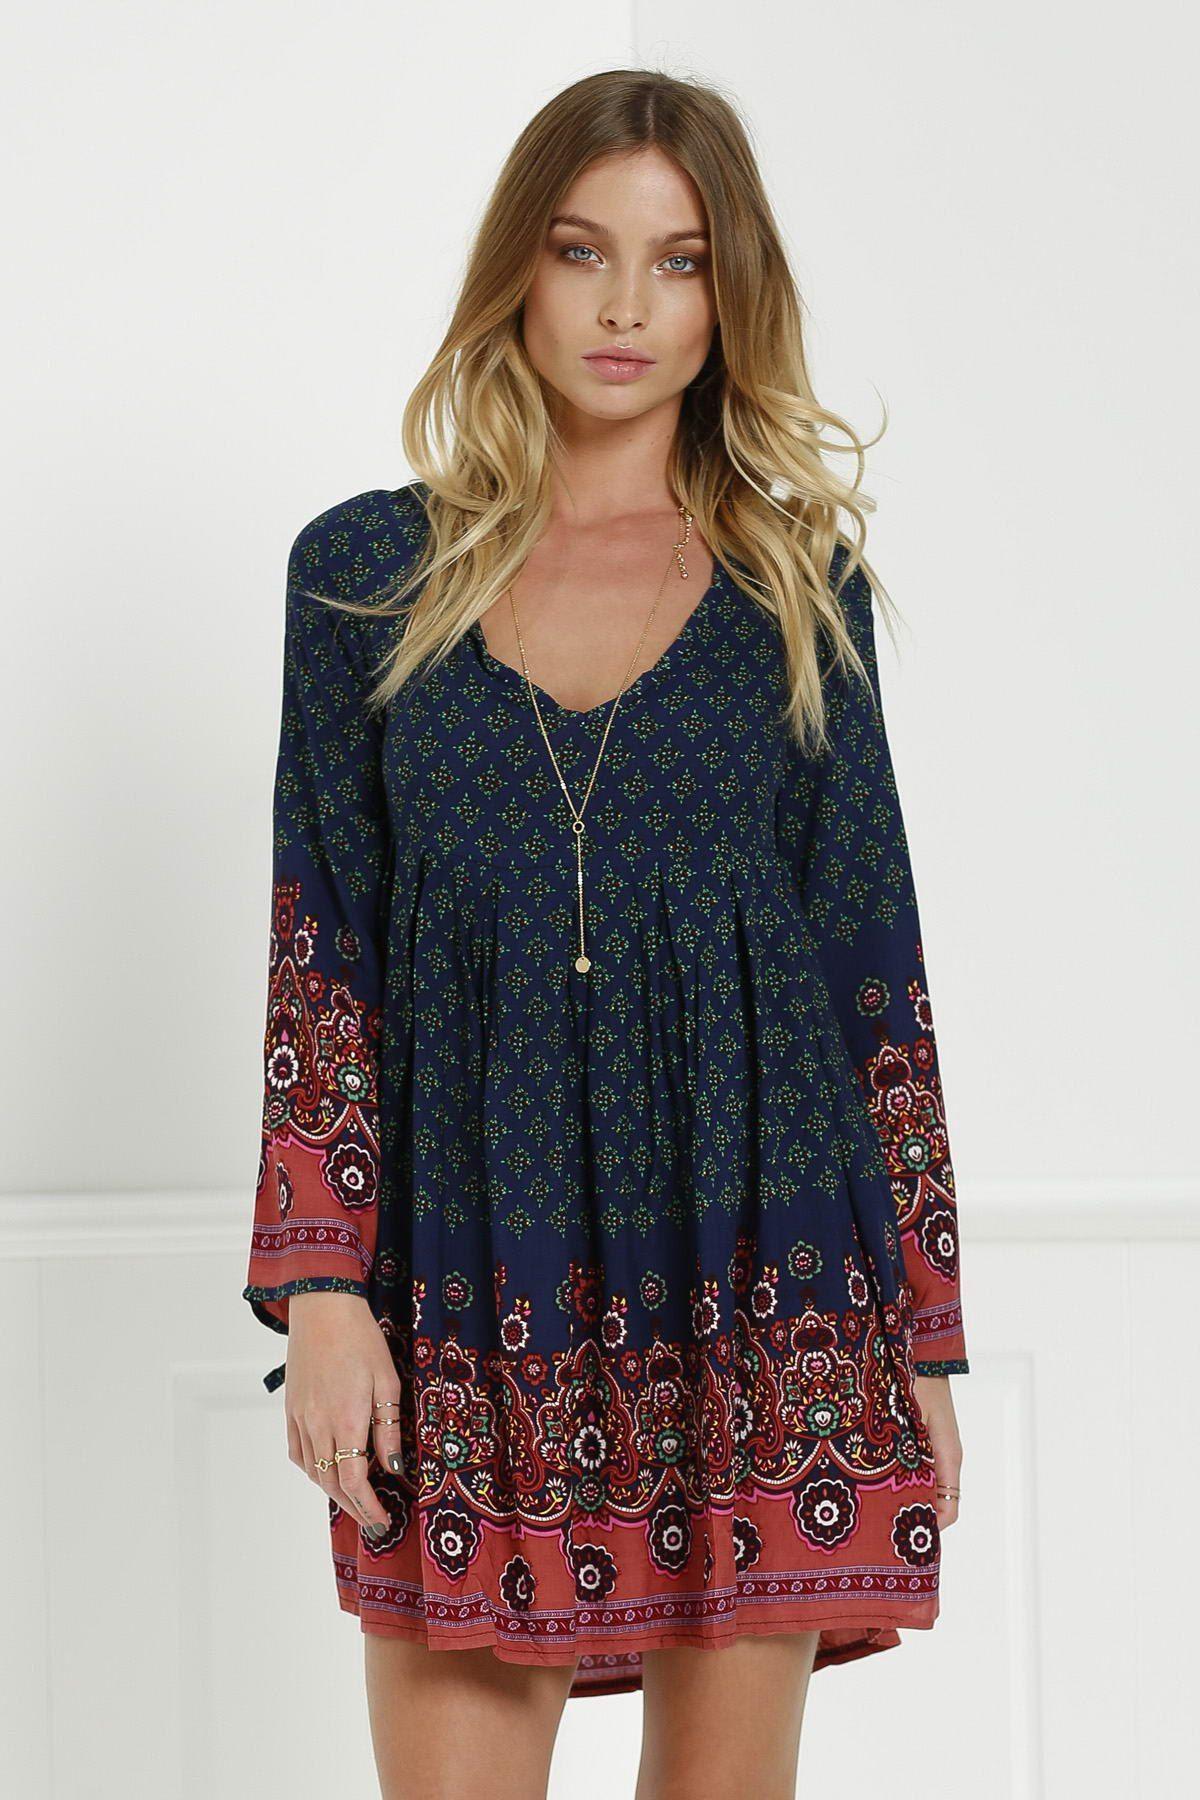 3 4 Sleeve Floral Tunic Dress Blue Womens Tunic Dress Fashion Boho Fashion [ 1800 x 1200 Pixel ]